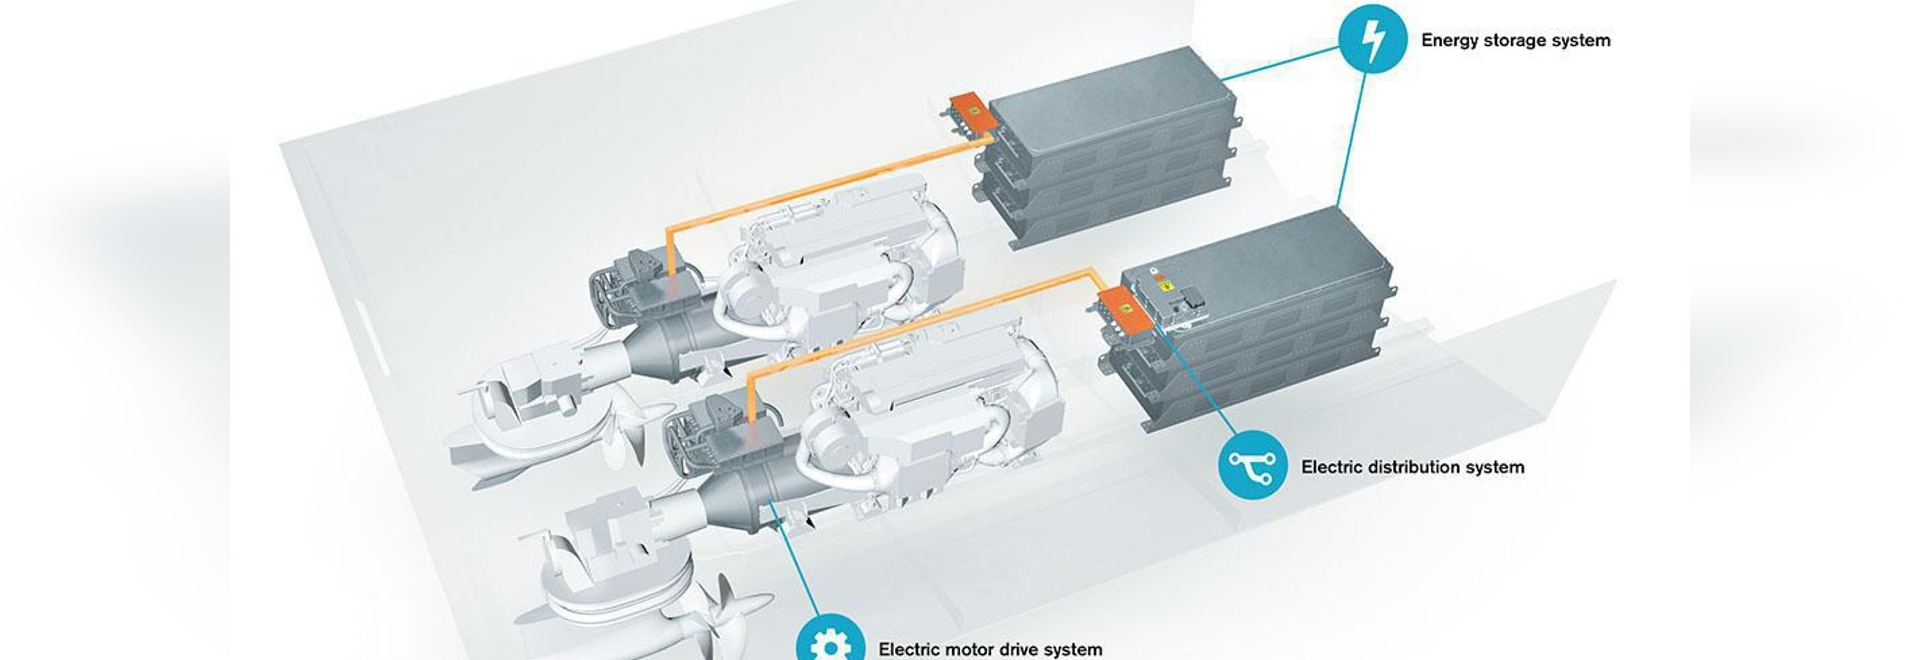 Volvo Penta dévoile le concept hybride de propulsion marine